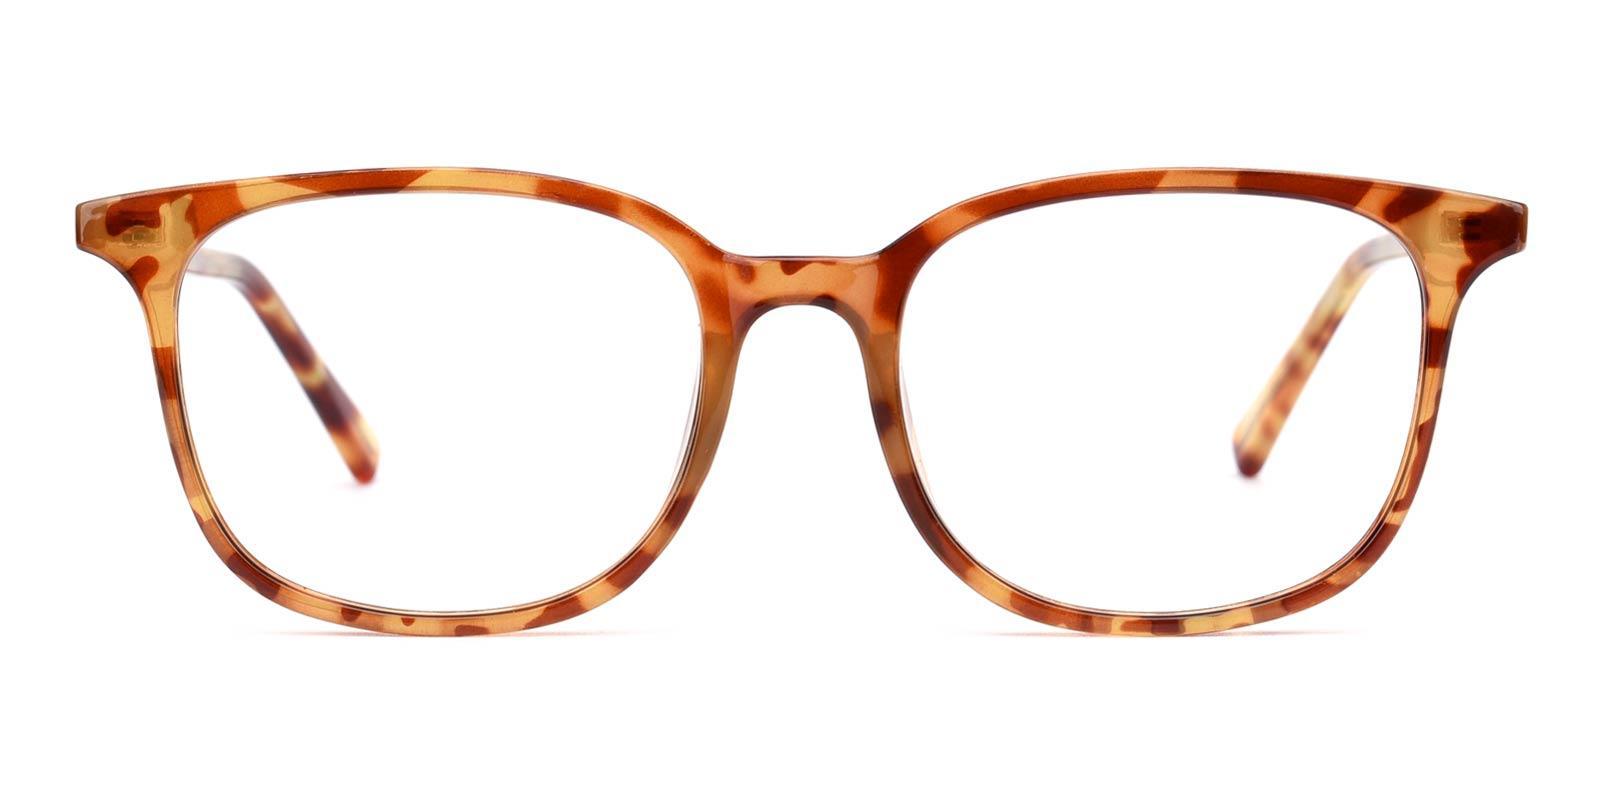 Corson-Tortoise-Rectangle-TR-Eyeglasses-detail